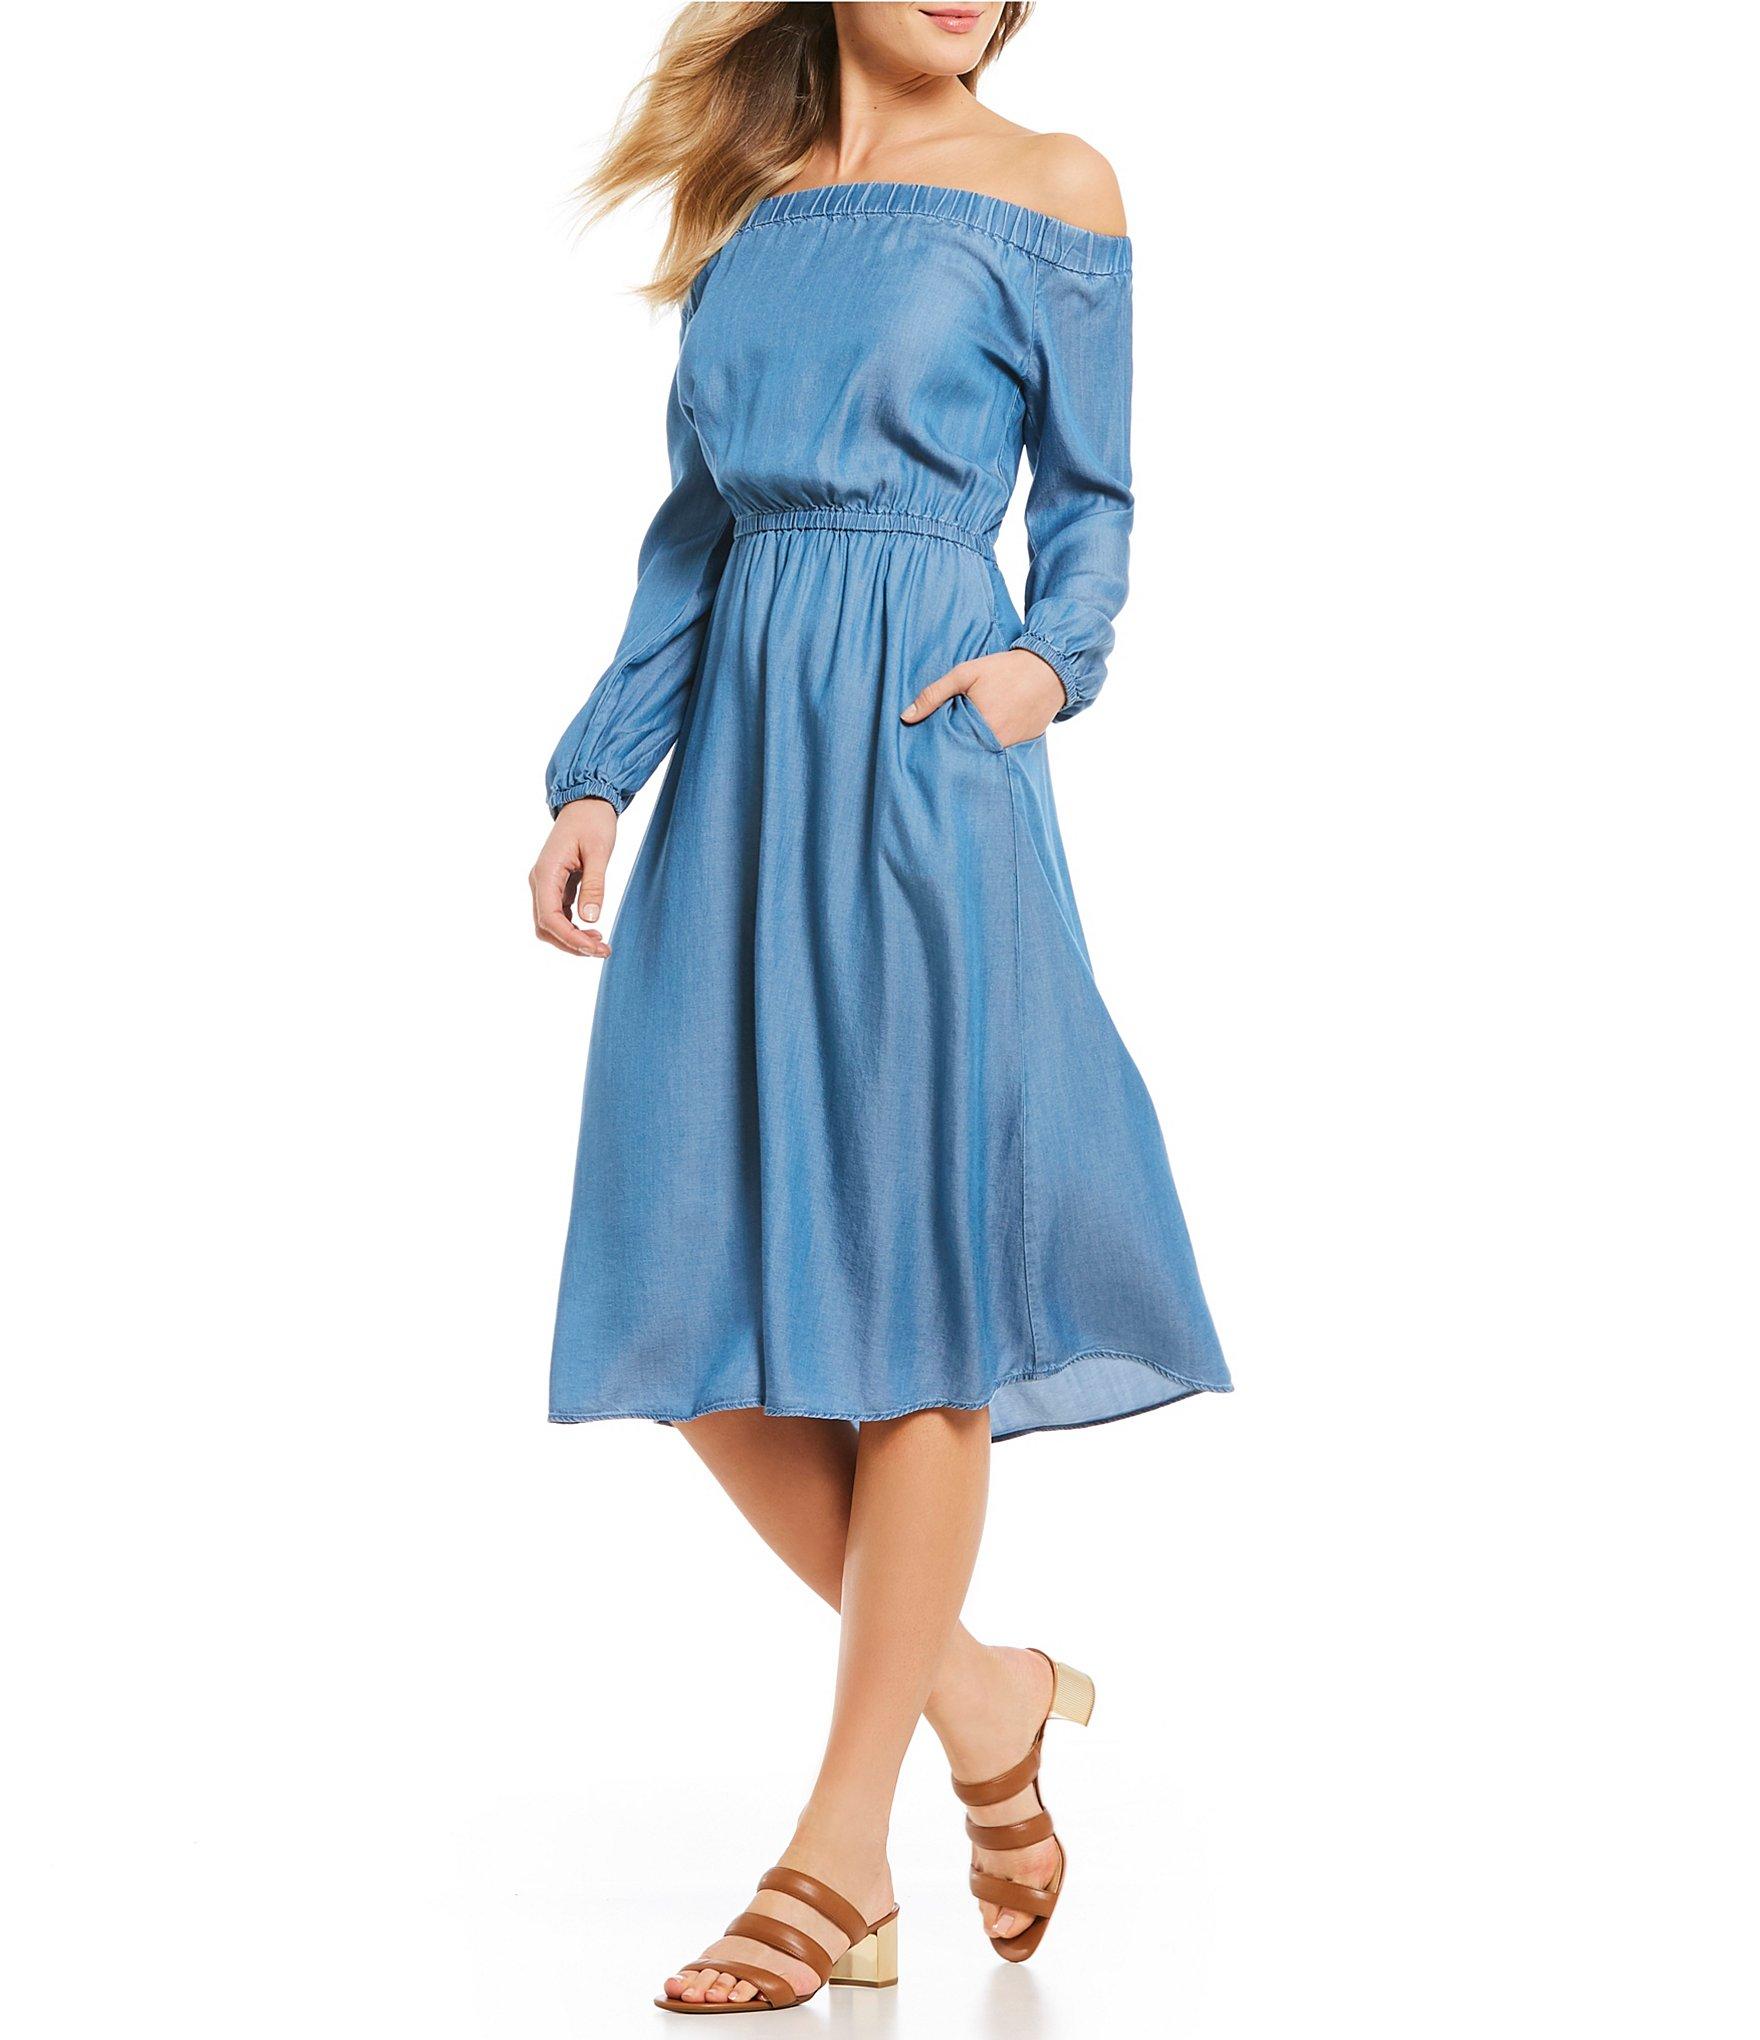 MICHAEL Michael Kors Women\'s Dresses & Gowns   Dillards